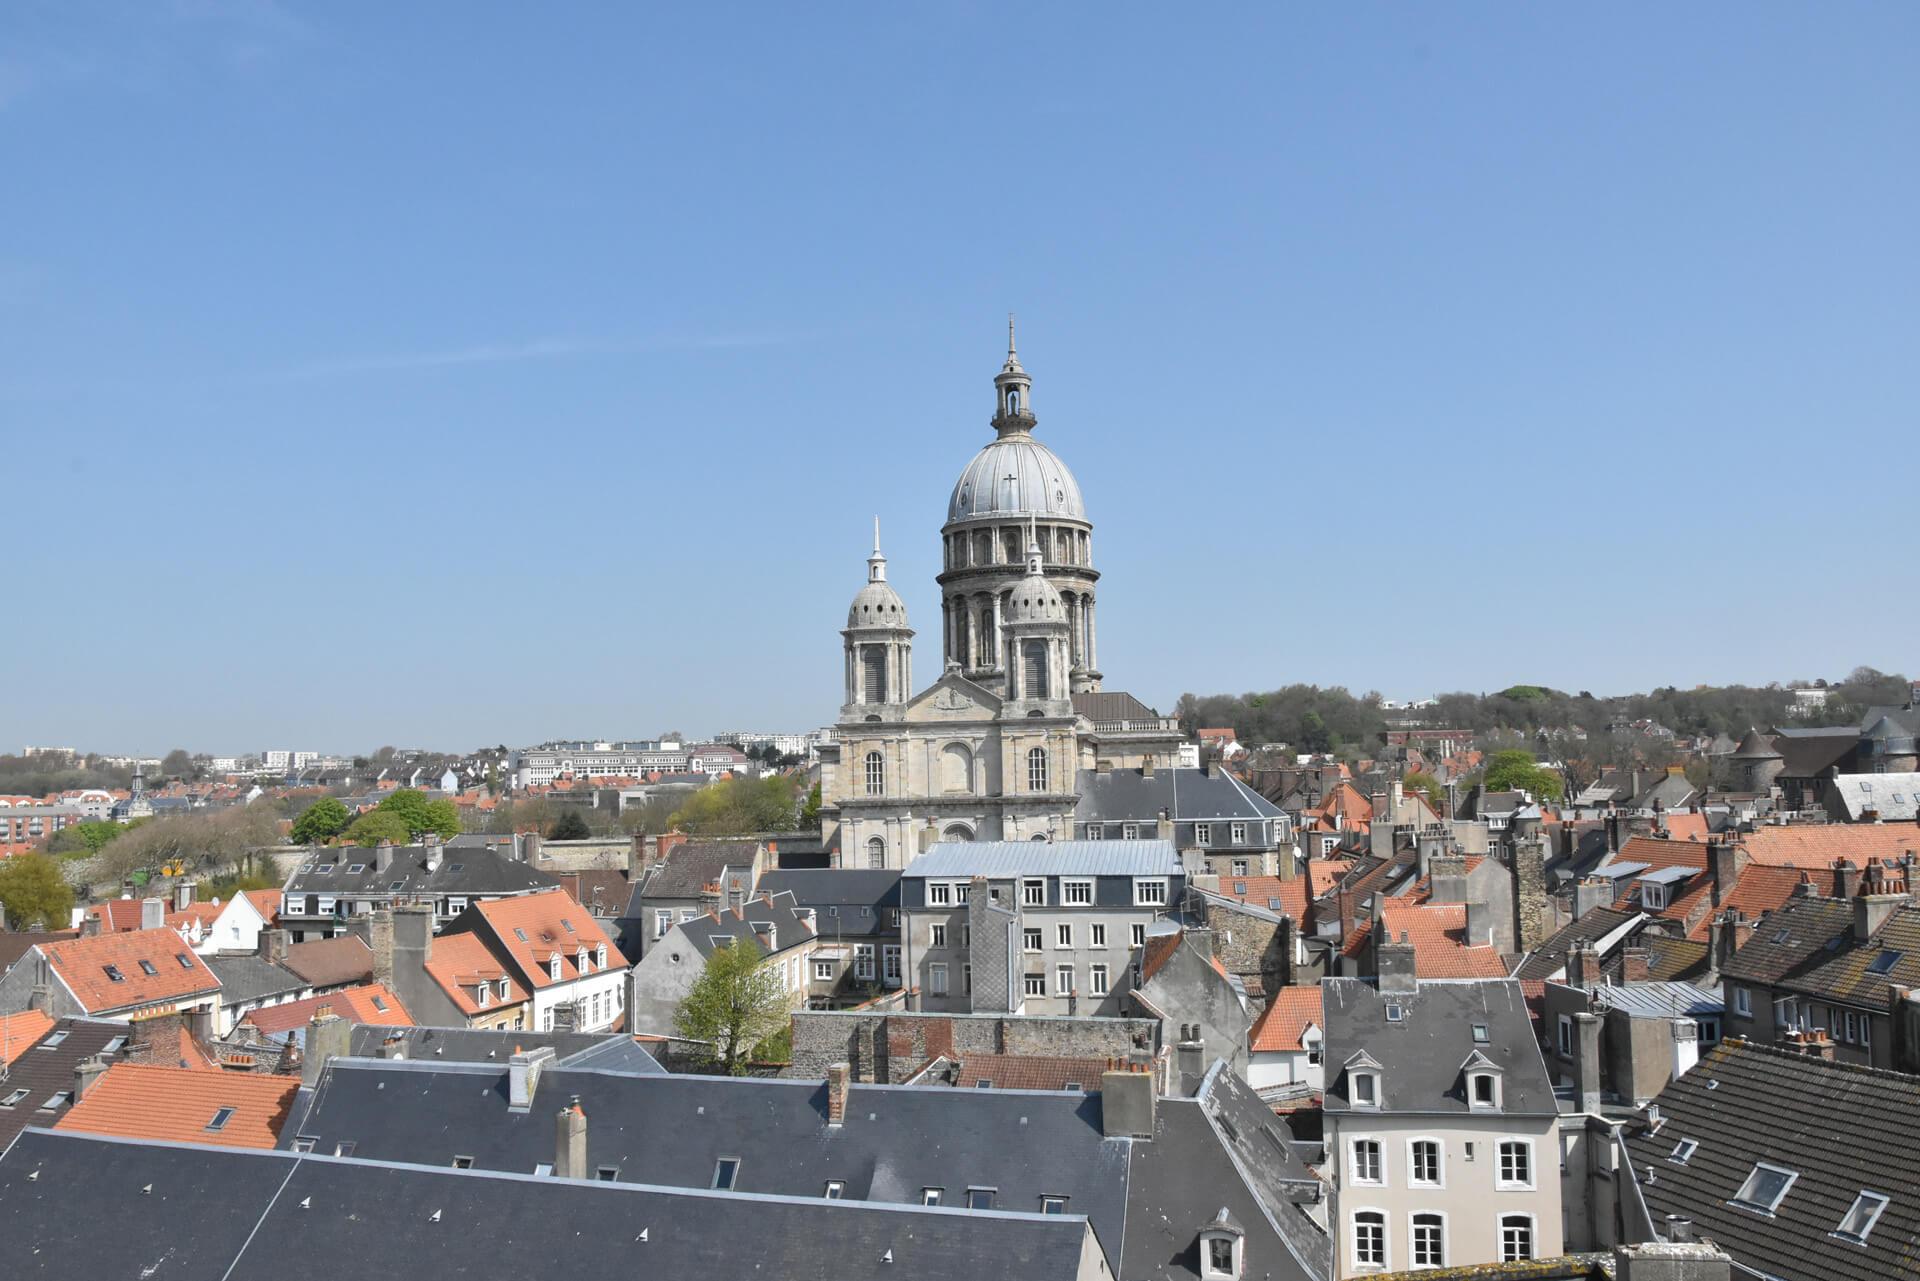 vue mairie cathedrale notre dame boulogne sur mer1